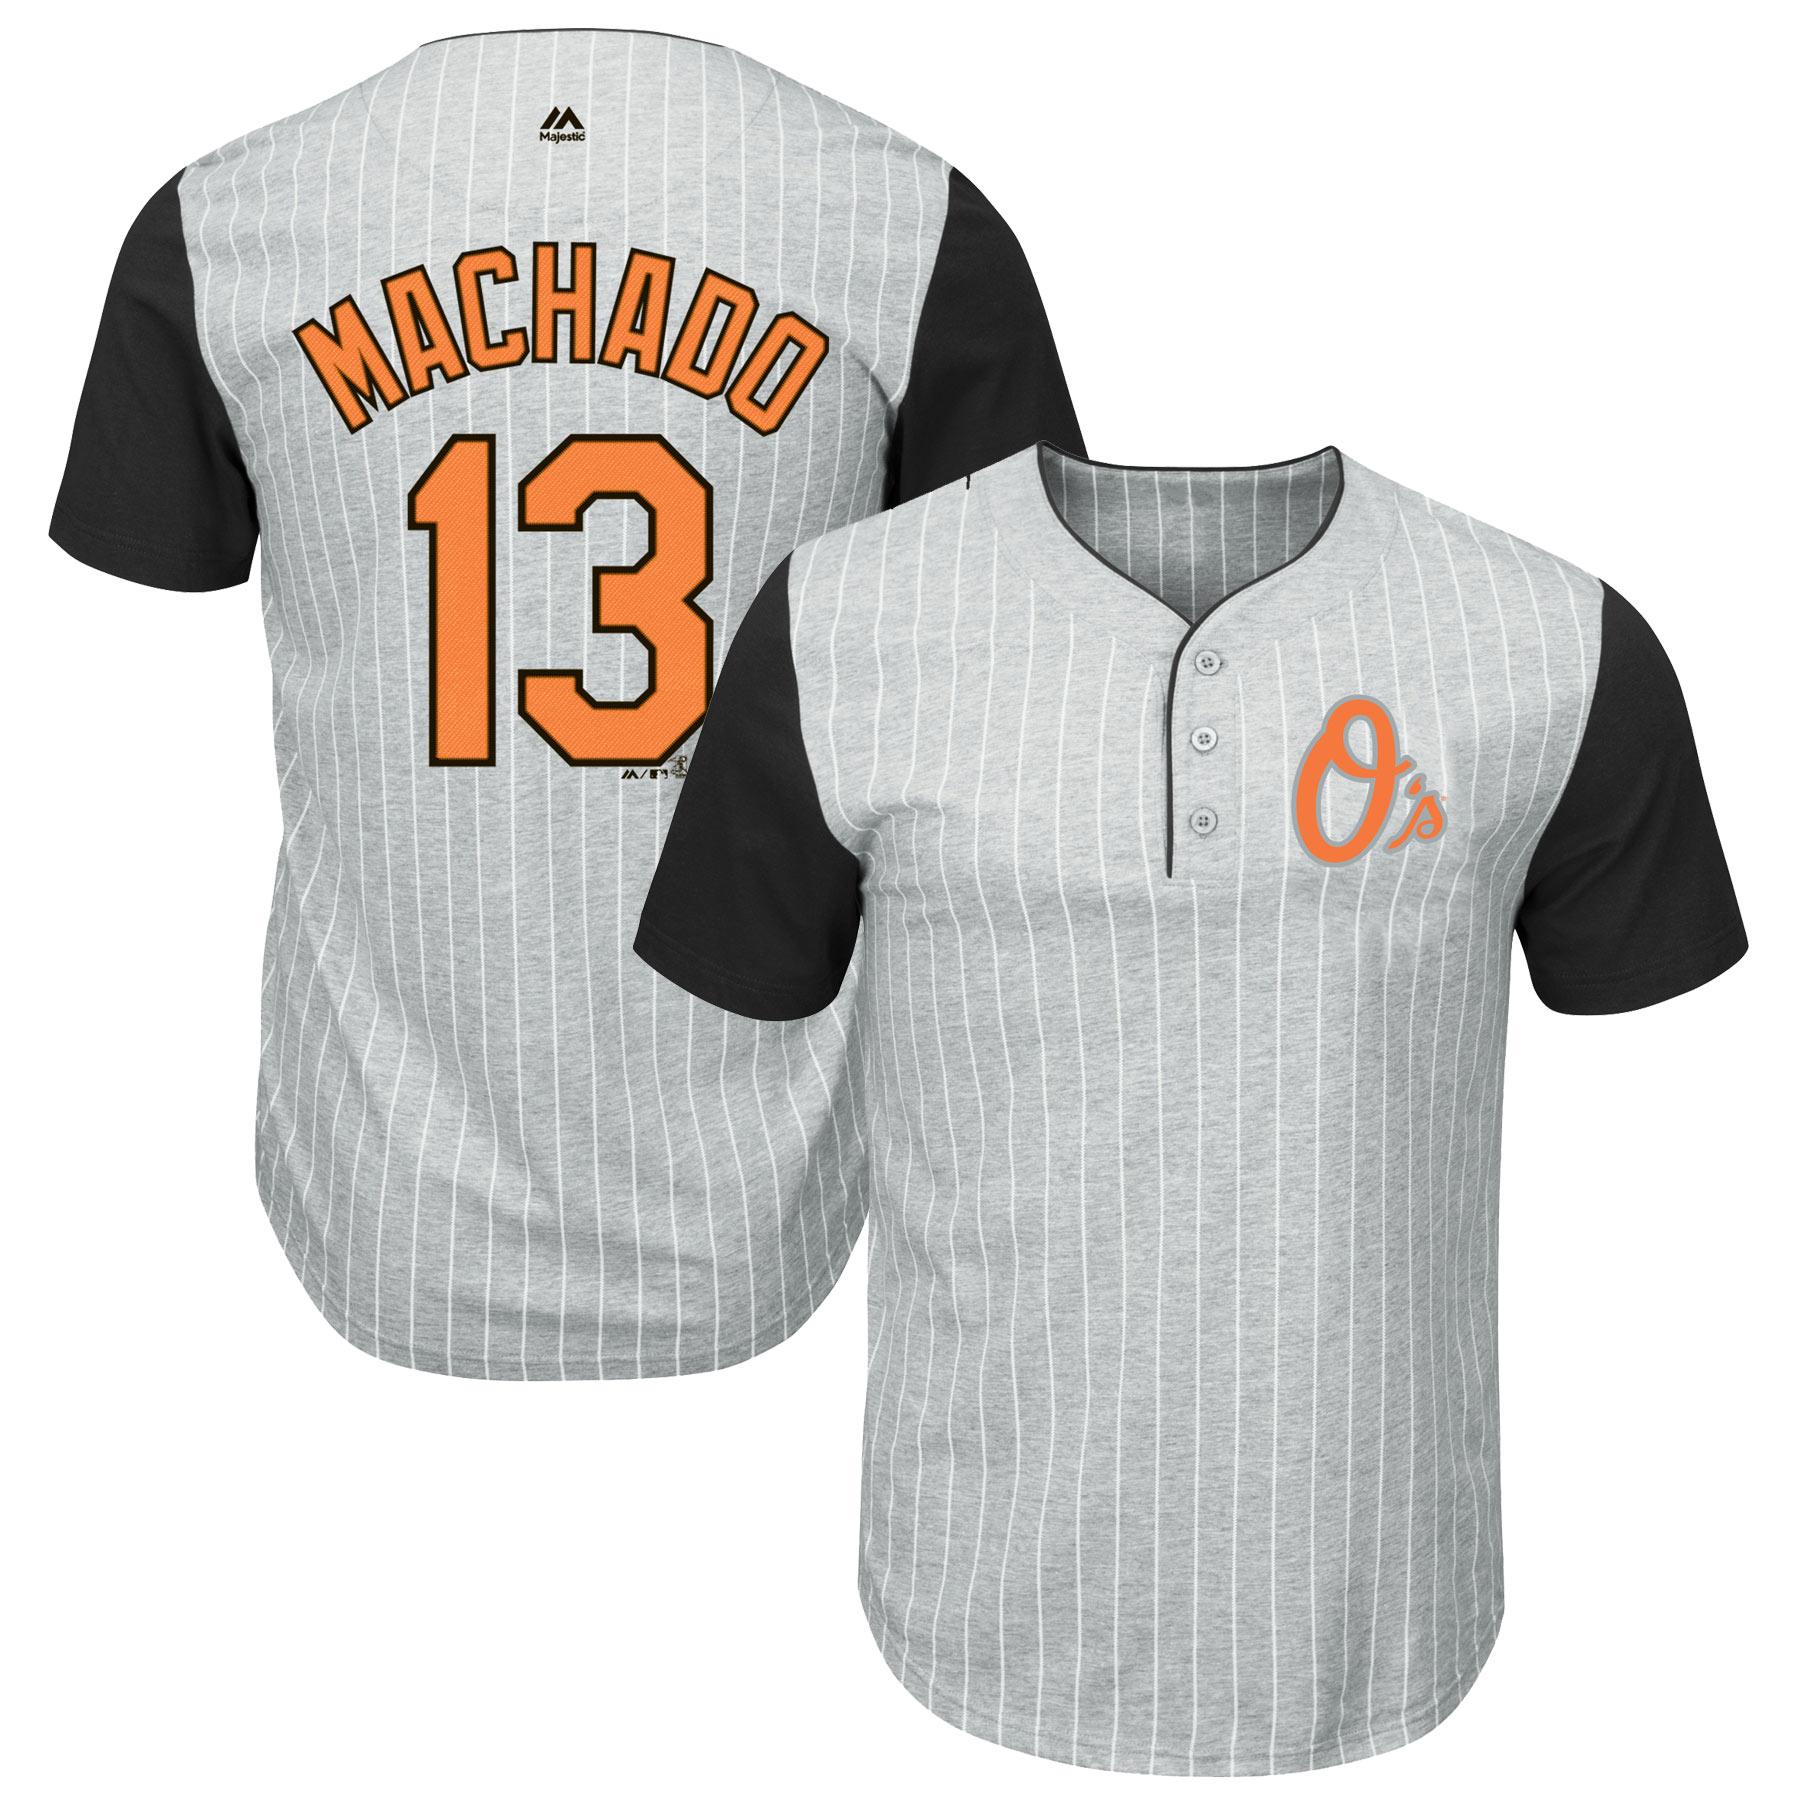 Manny Machado Baltimore Orioles Majestic Big & Tall Pinstripe Player T-Shirt - Gray/Black